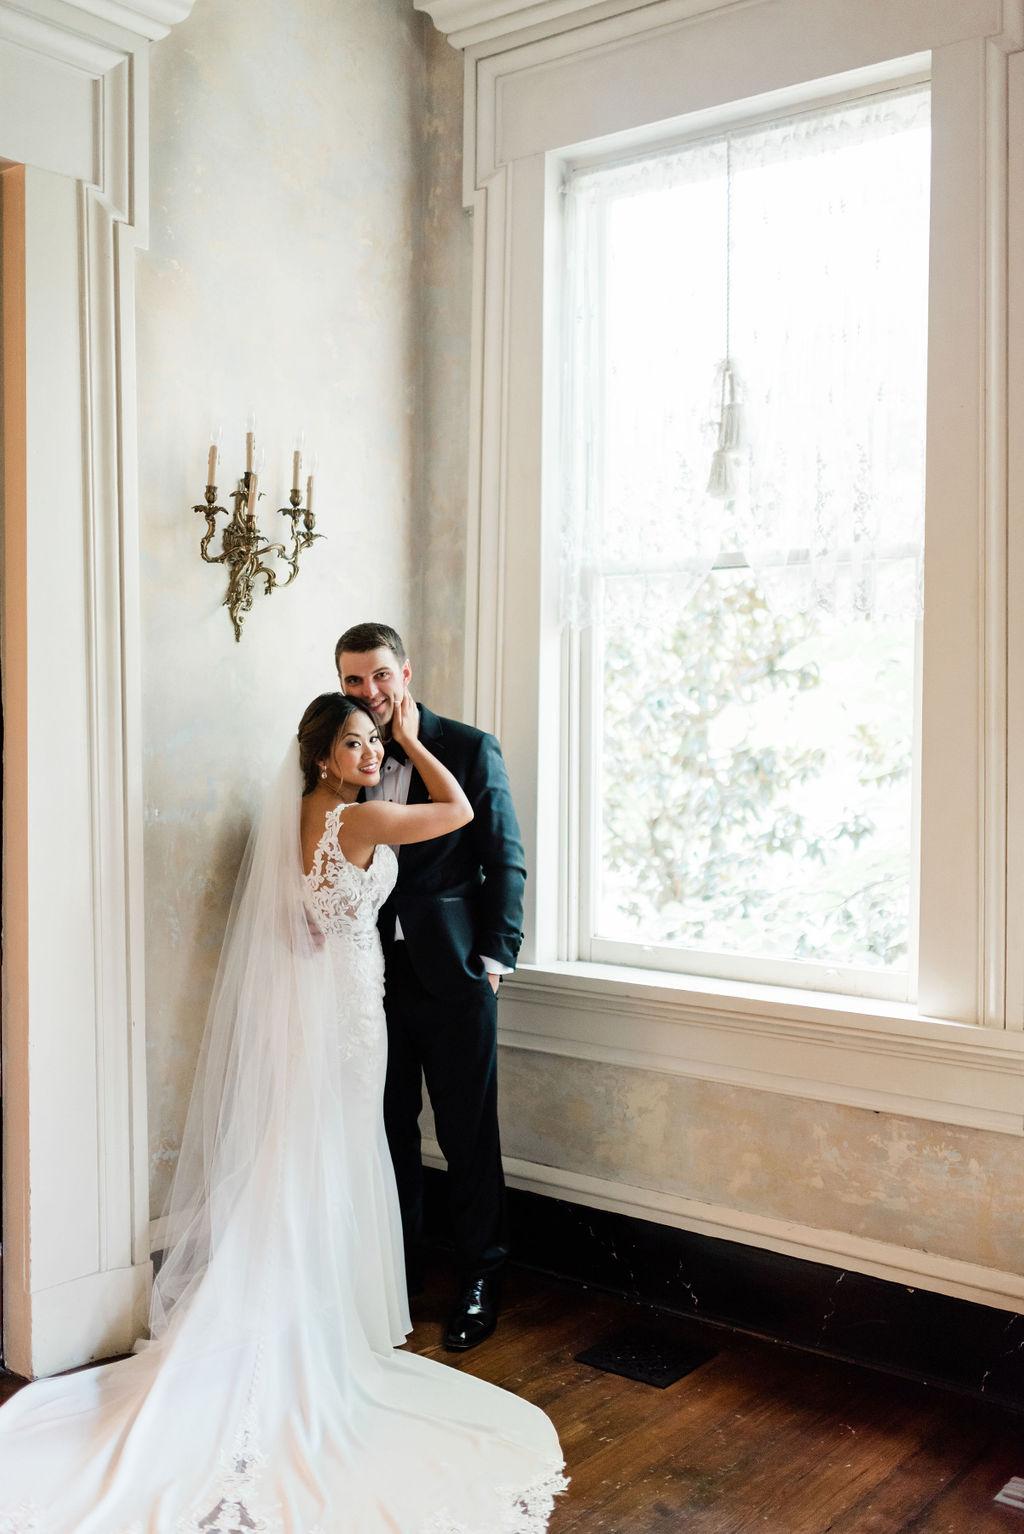 Wedding portrait by Nashville wedding photographer Maria Gloer Photography